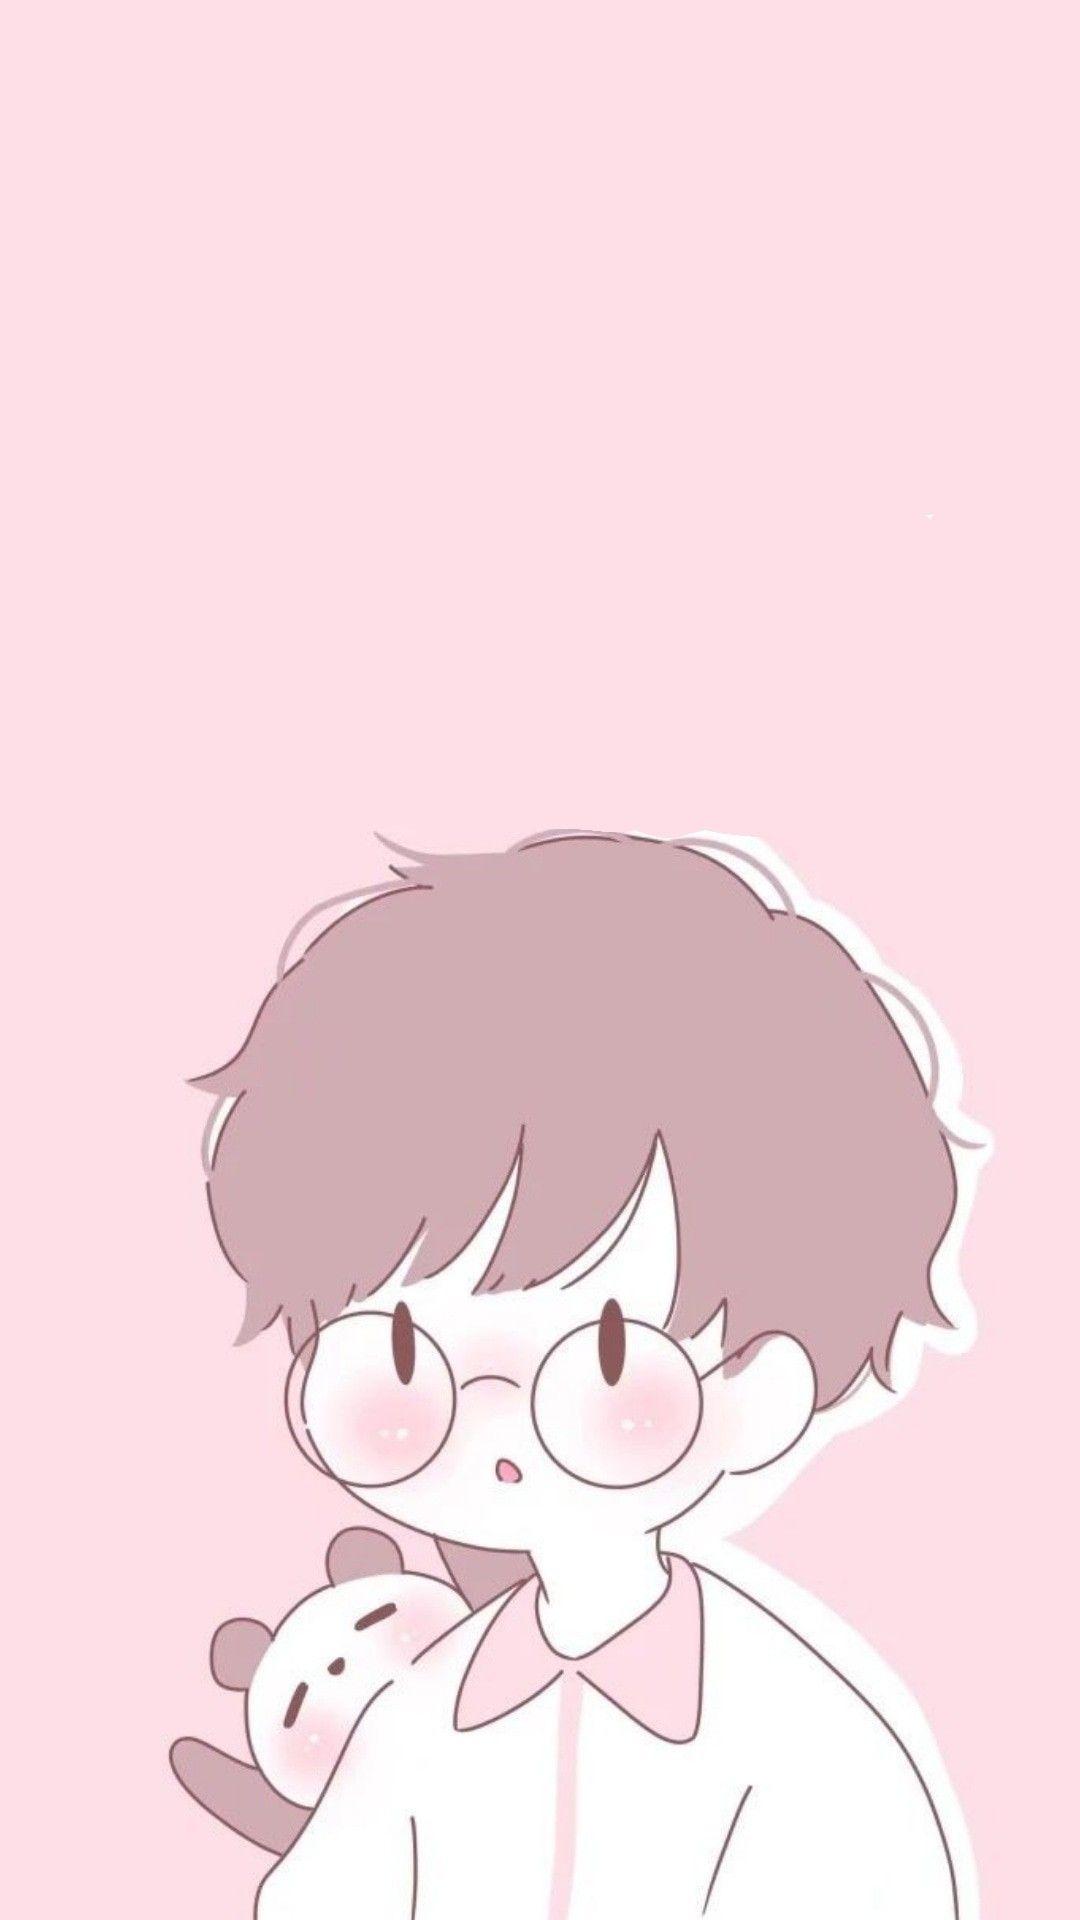 Pin By Ri On Creative Minds Kawaii Drawings Kawaii Wallpaper Cute Drawings